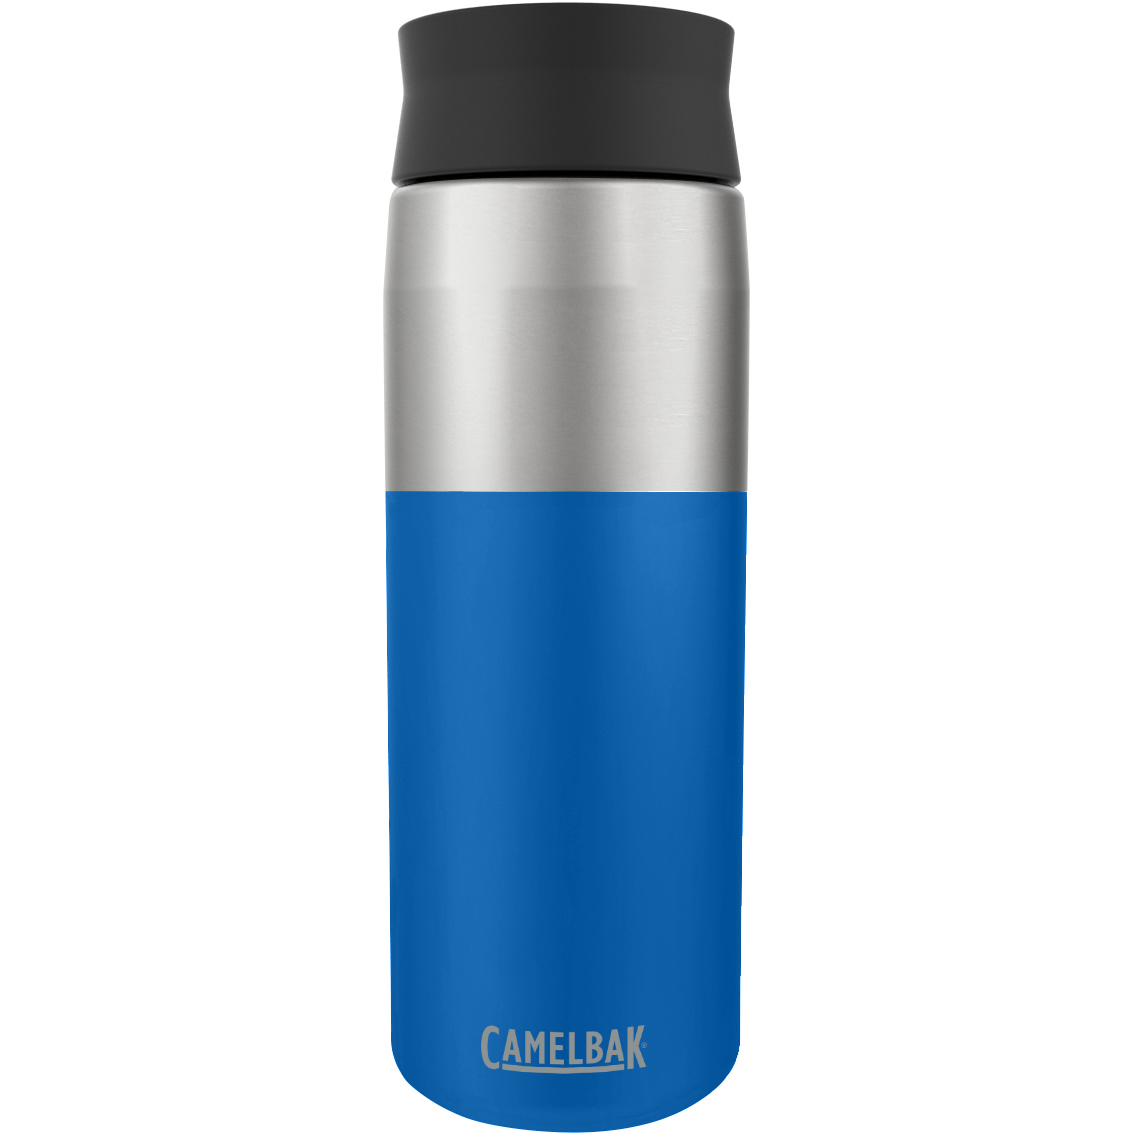 Camelbak HOT CAP VAC. 0,6L, steklenica, modra